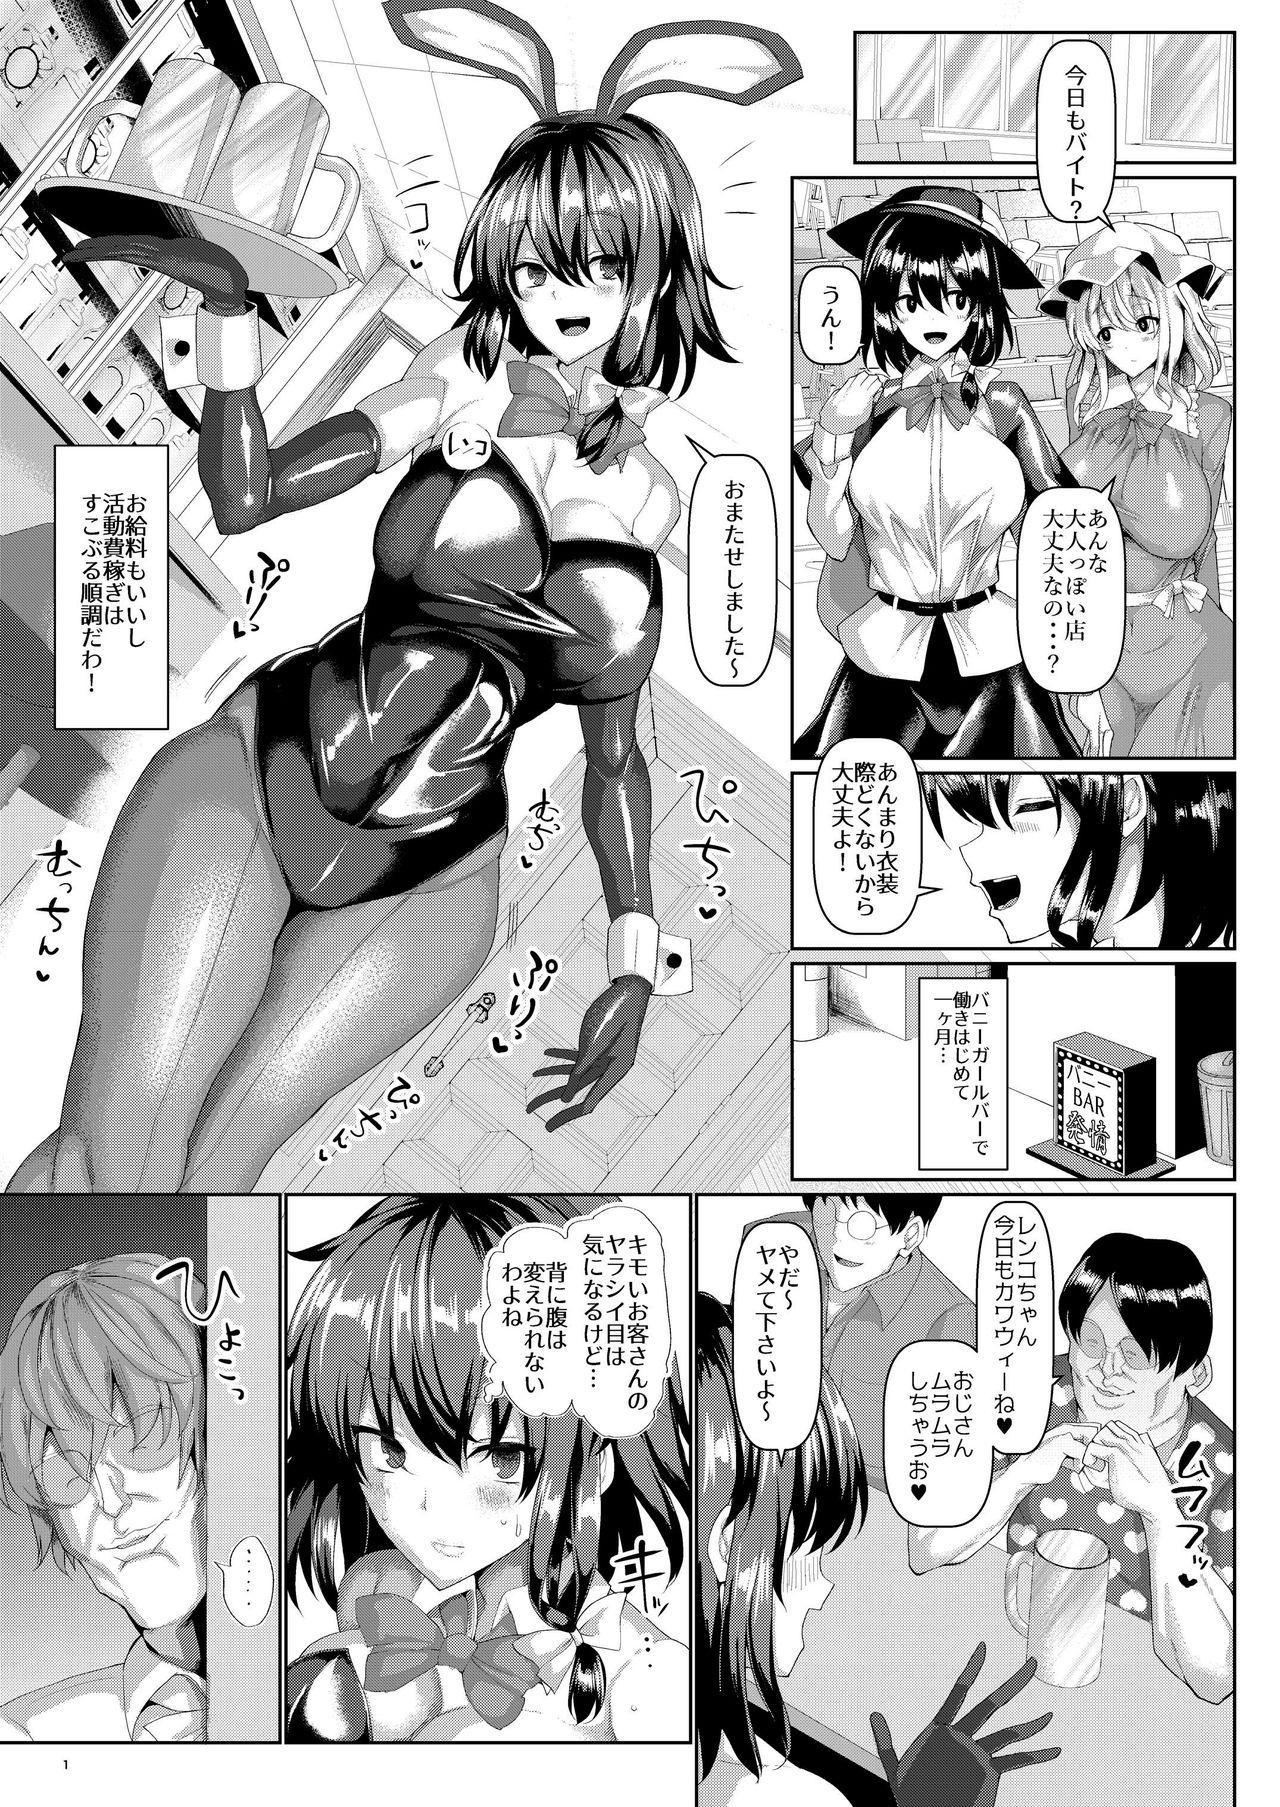 Renko Sennyuu! Saimin Bunny Girl 2